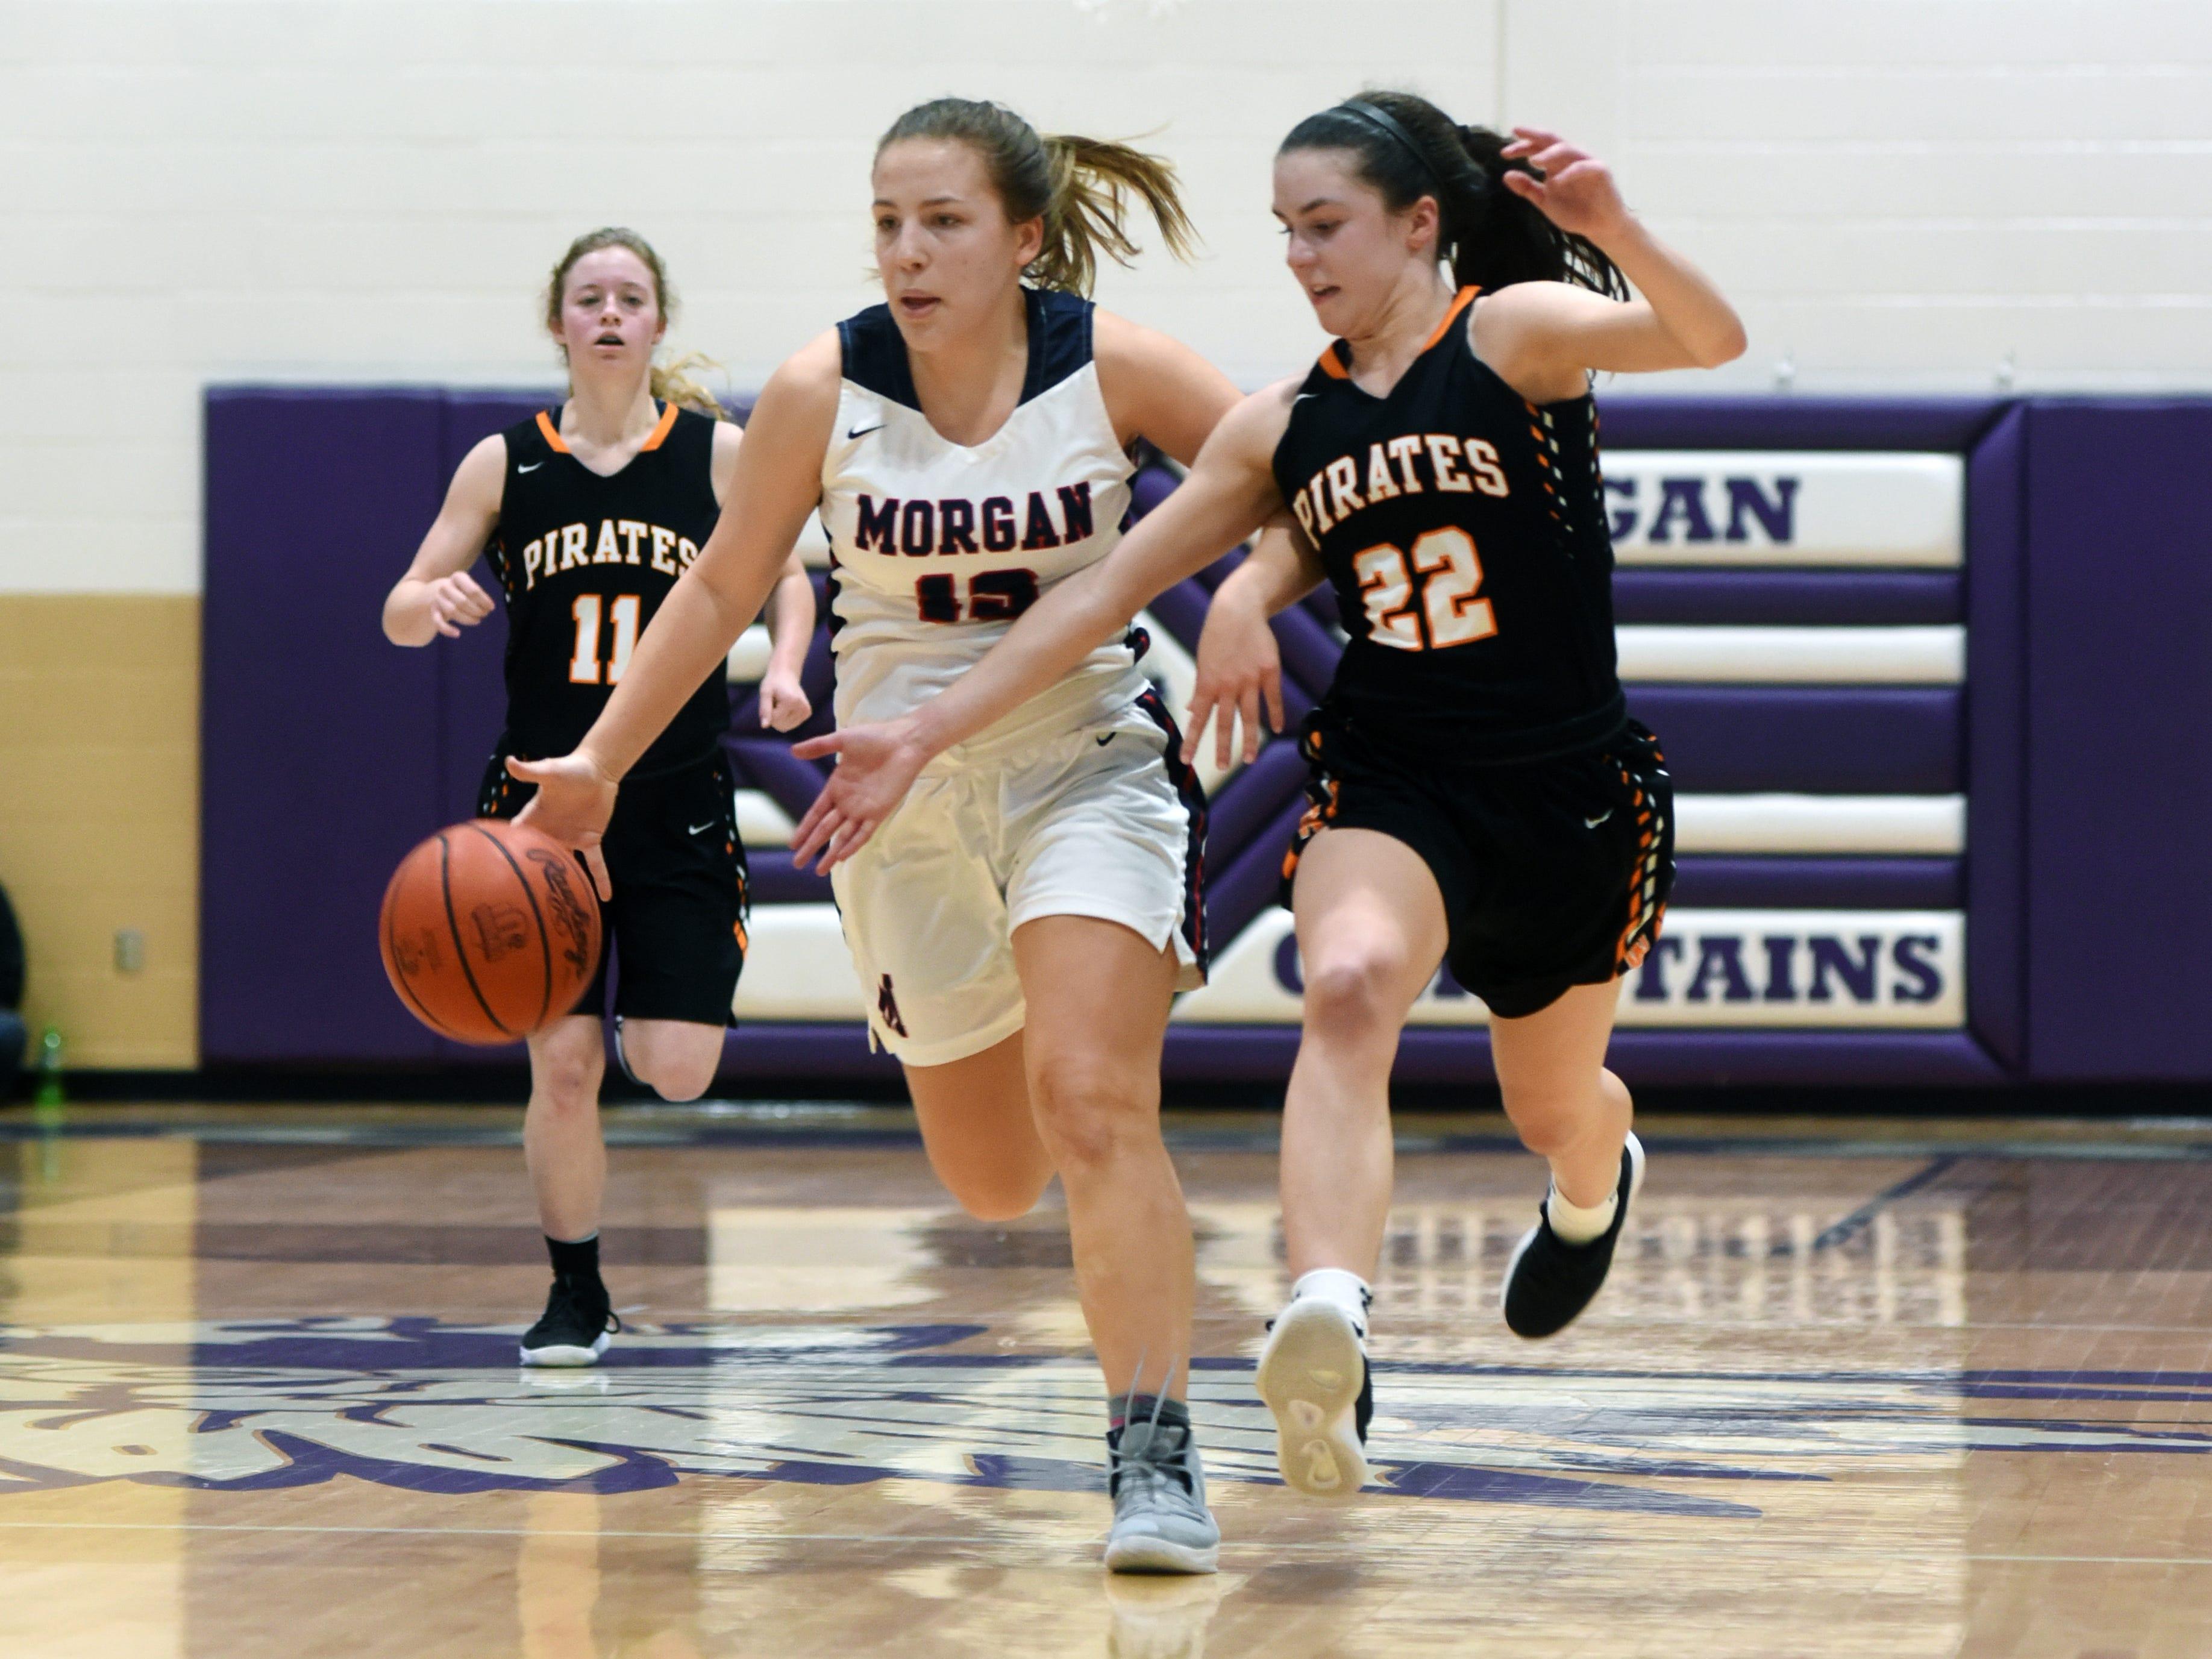 Riley Coon dribbles past Wheelersburg's Ellie Kallner during Morgan's 56-55 loss to Wheelersburg in a Division III regional semifinal at Logan.